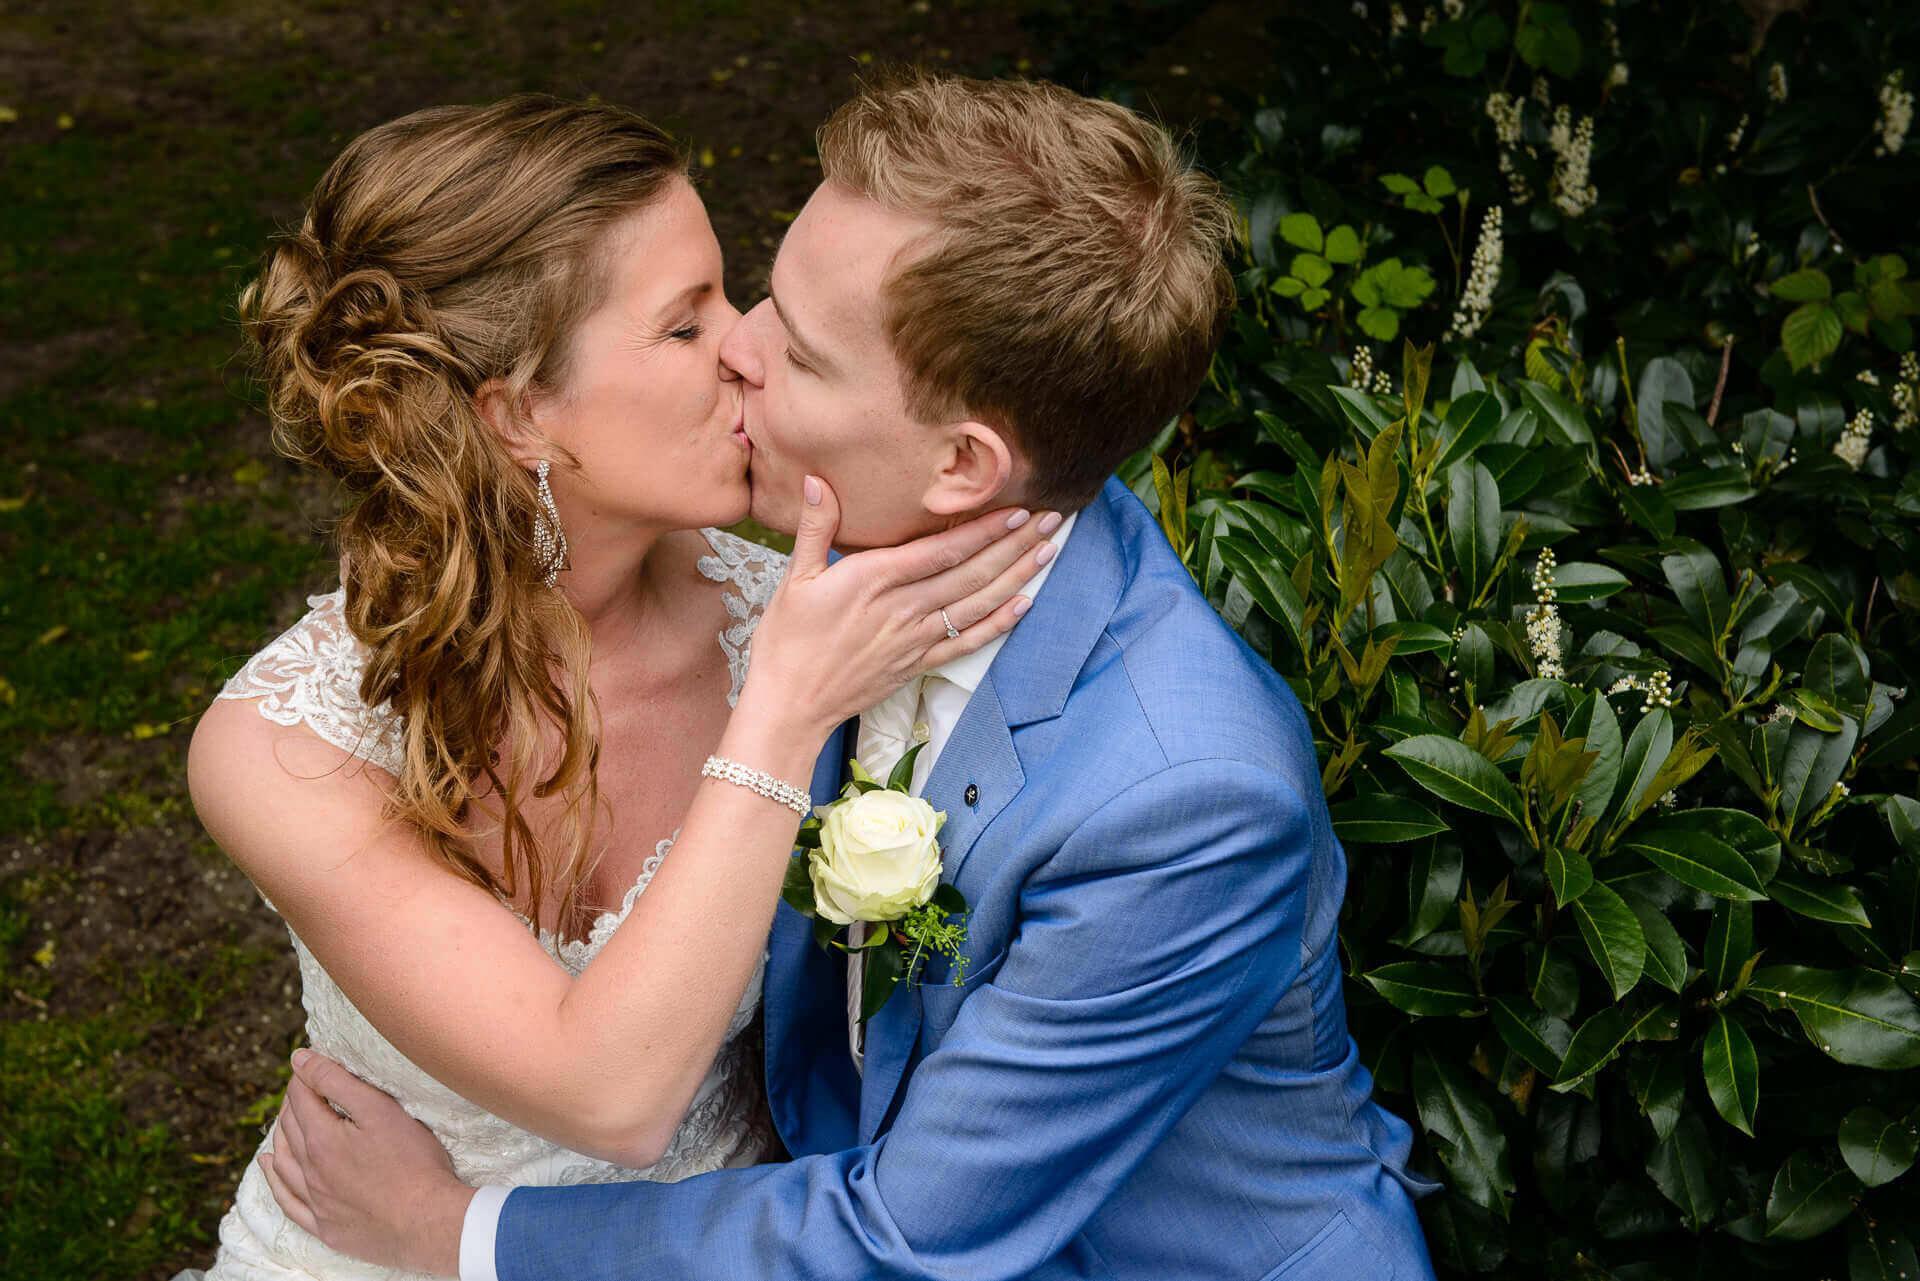 Bruiloft fotograaf Sandy Peters fotografie Raadhuis in Vught Noord-Brabant